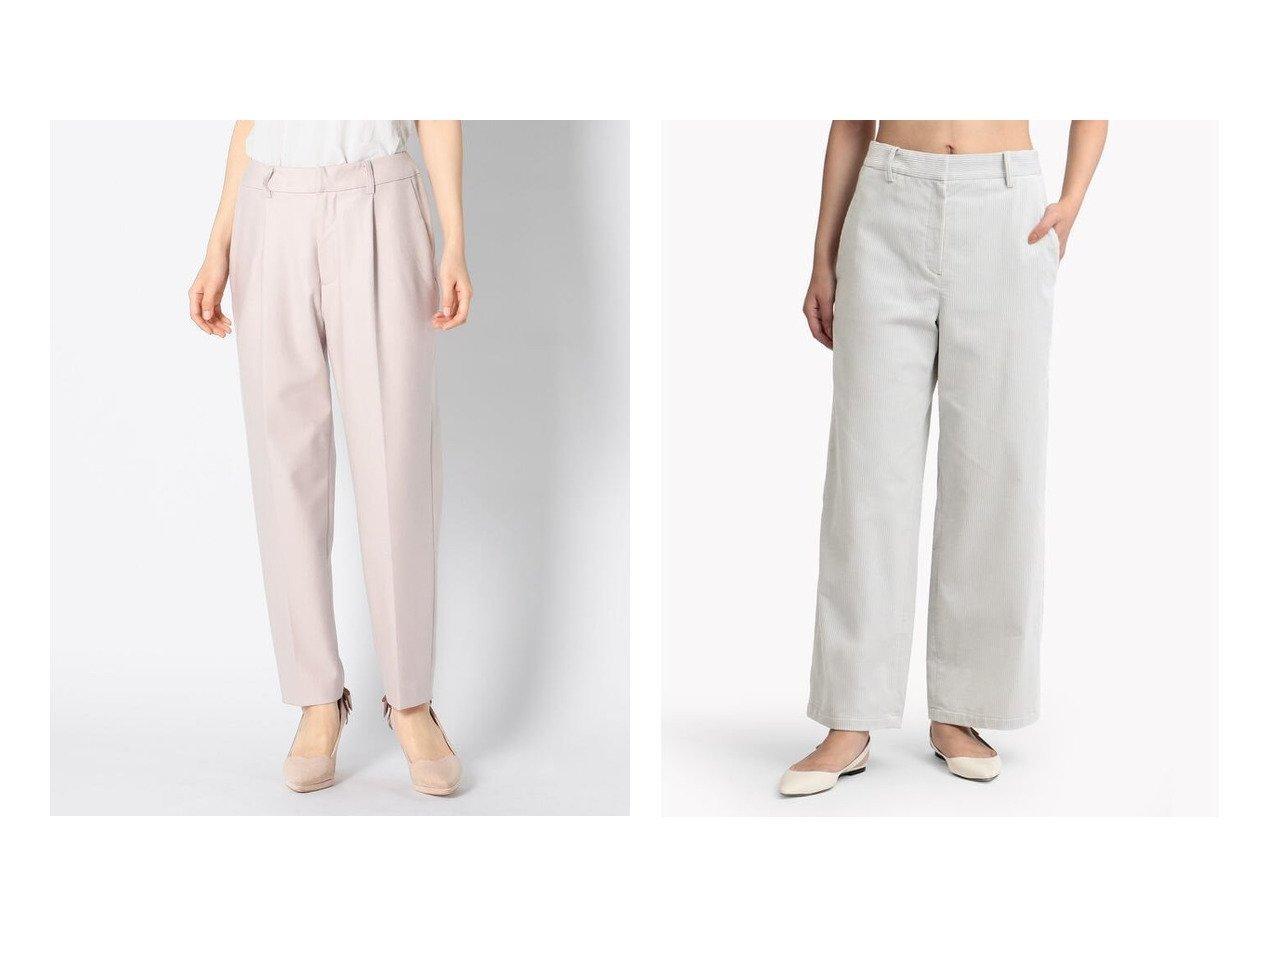 【Theory Luxe/セオリーリュクス】のパンツ WING LISOL A&【MISCH MASCH/ミッシュマッシュ】の両面起毛タックパンツ パンツのおすすめ!人気、トレンド・レディースファッションの通販 おすすめで人気の流行・トレンド、ファッションの通販商品 メンズファッション・キッズファッション・インテリア・家具・レディースファッション・服の通販 founy(ファニー) https://founy.com/ ファッション Fashion レディースファッション WOMEN パンツ Pants ベーシック コーデュロイ ファブリック フィット  ID:crp329100000012889